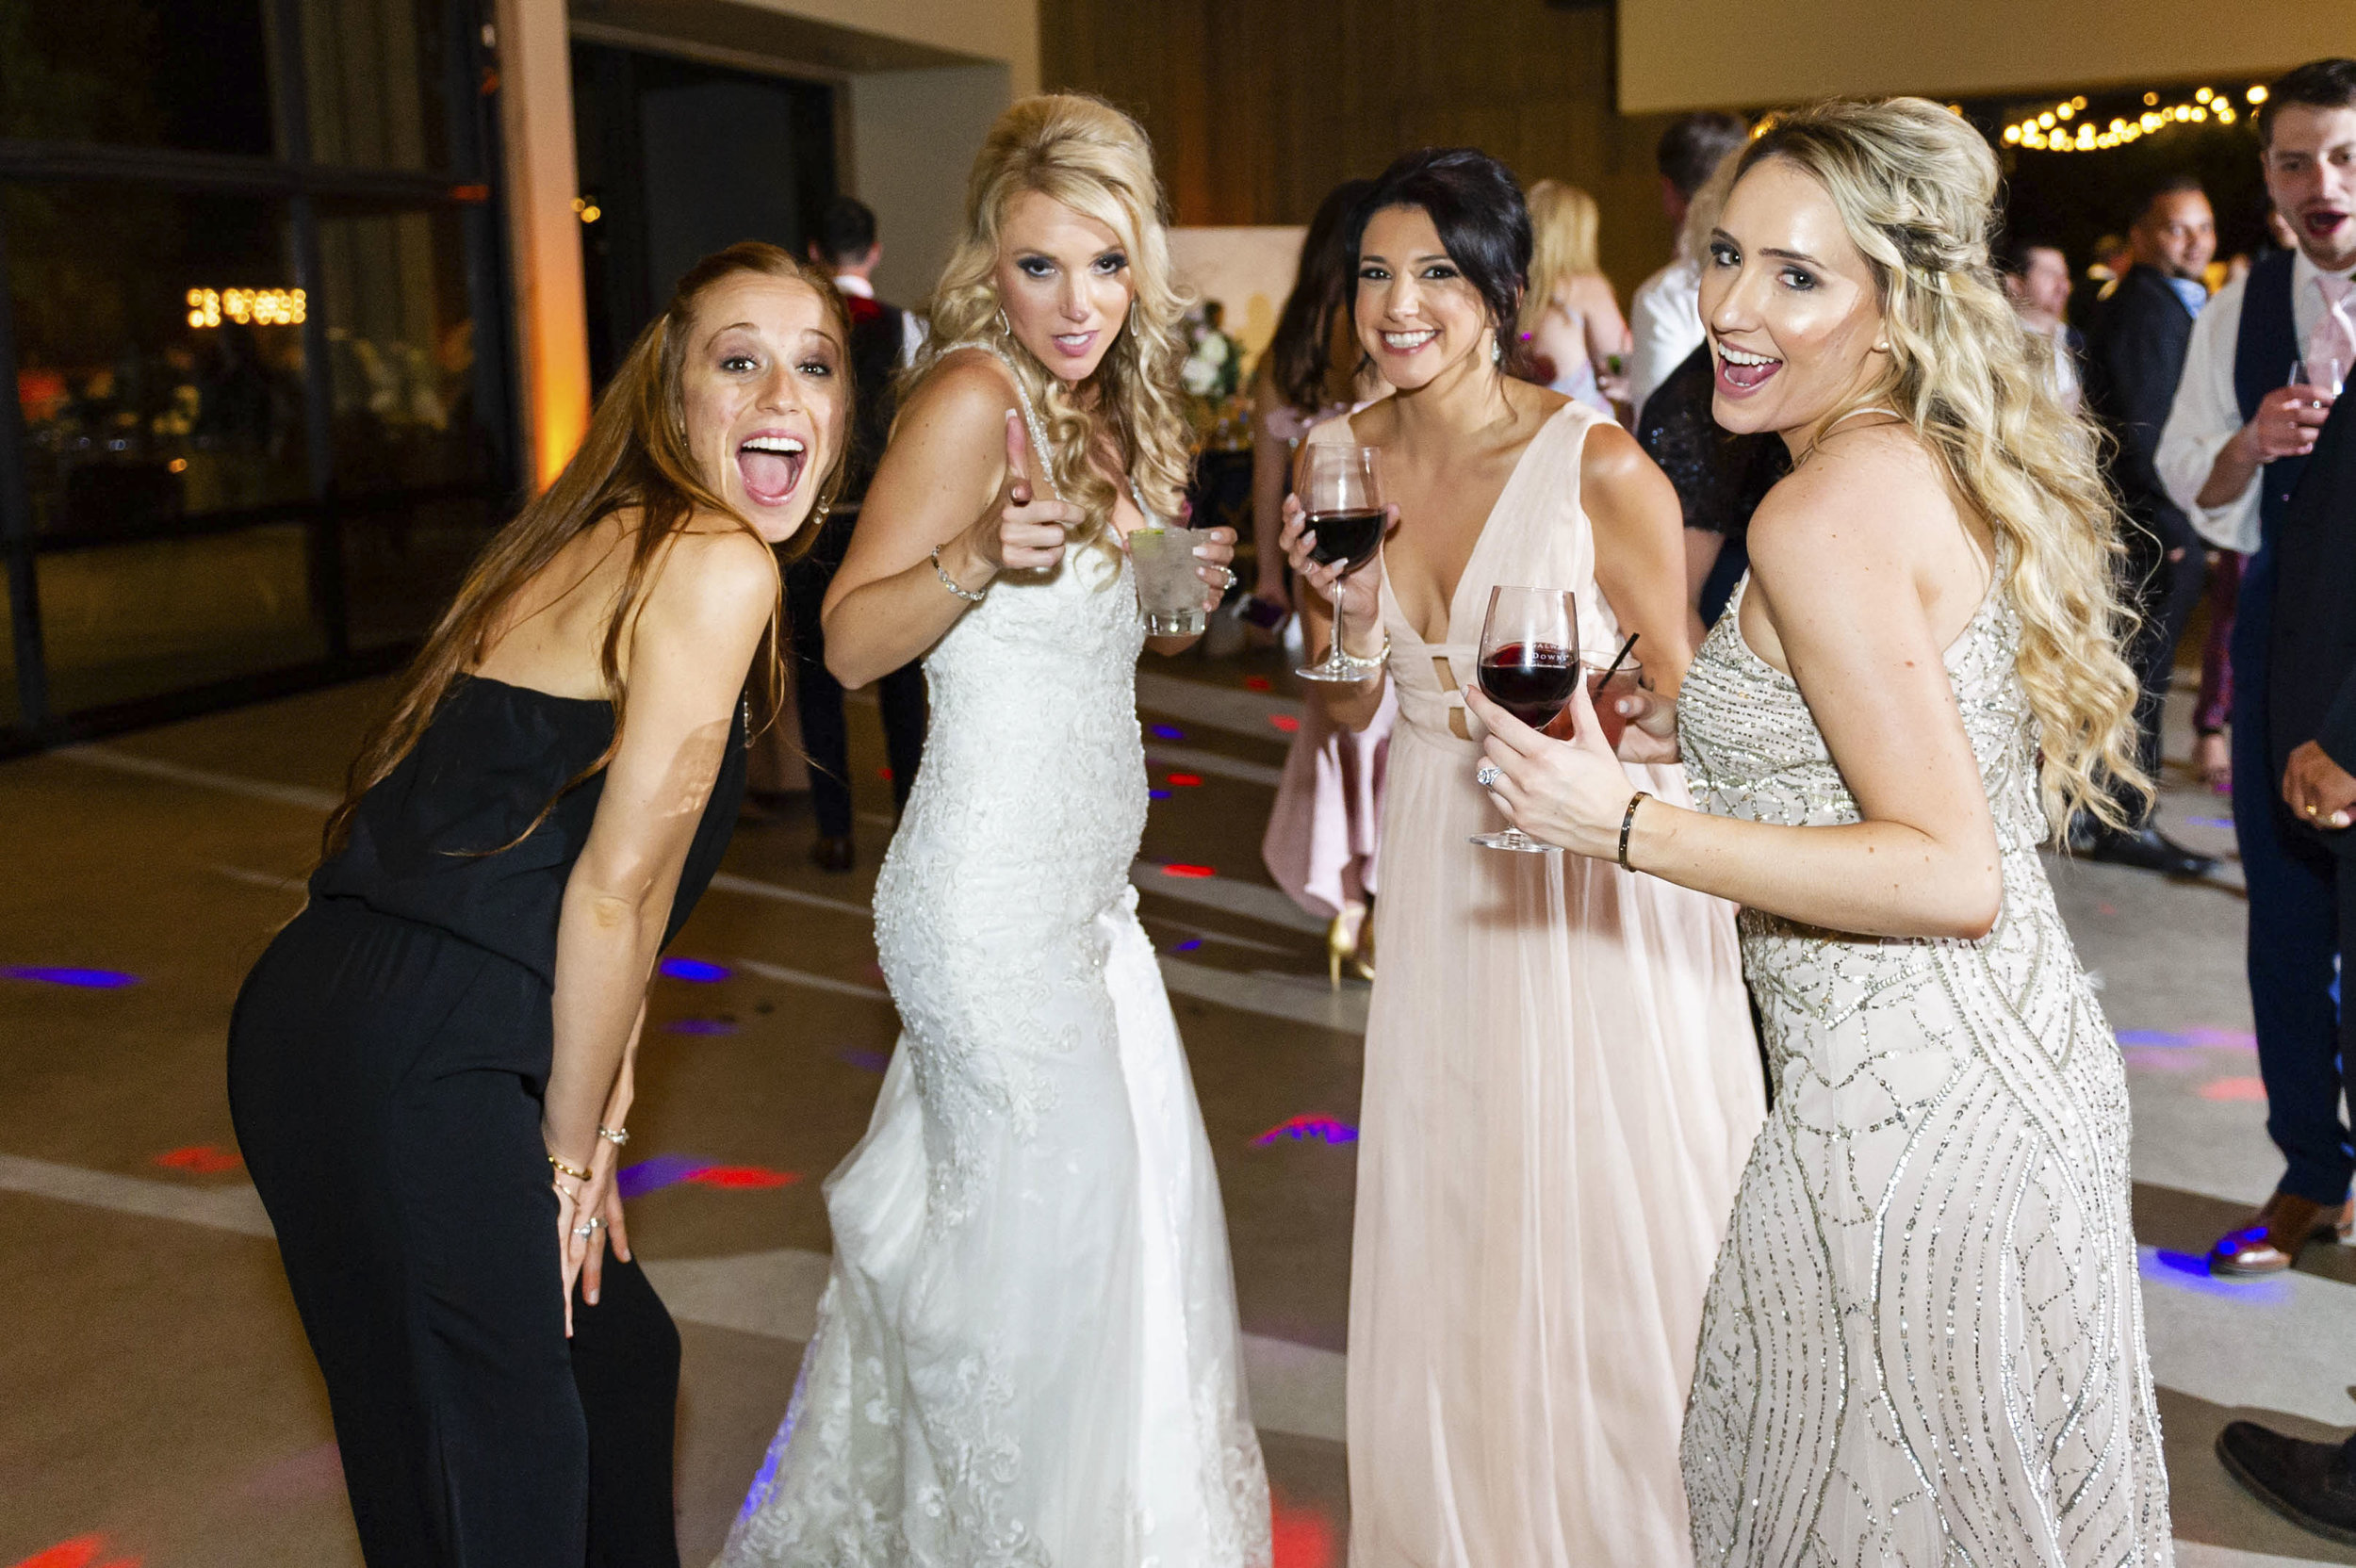 Domenica Beauty _ Hair and Makeup Artist _Wedding _ Temecula, CA Wedding _ Briana and Samuel _ 41.JPG